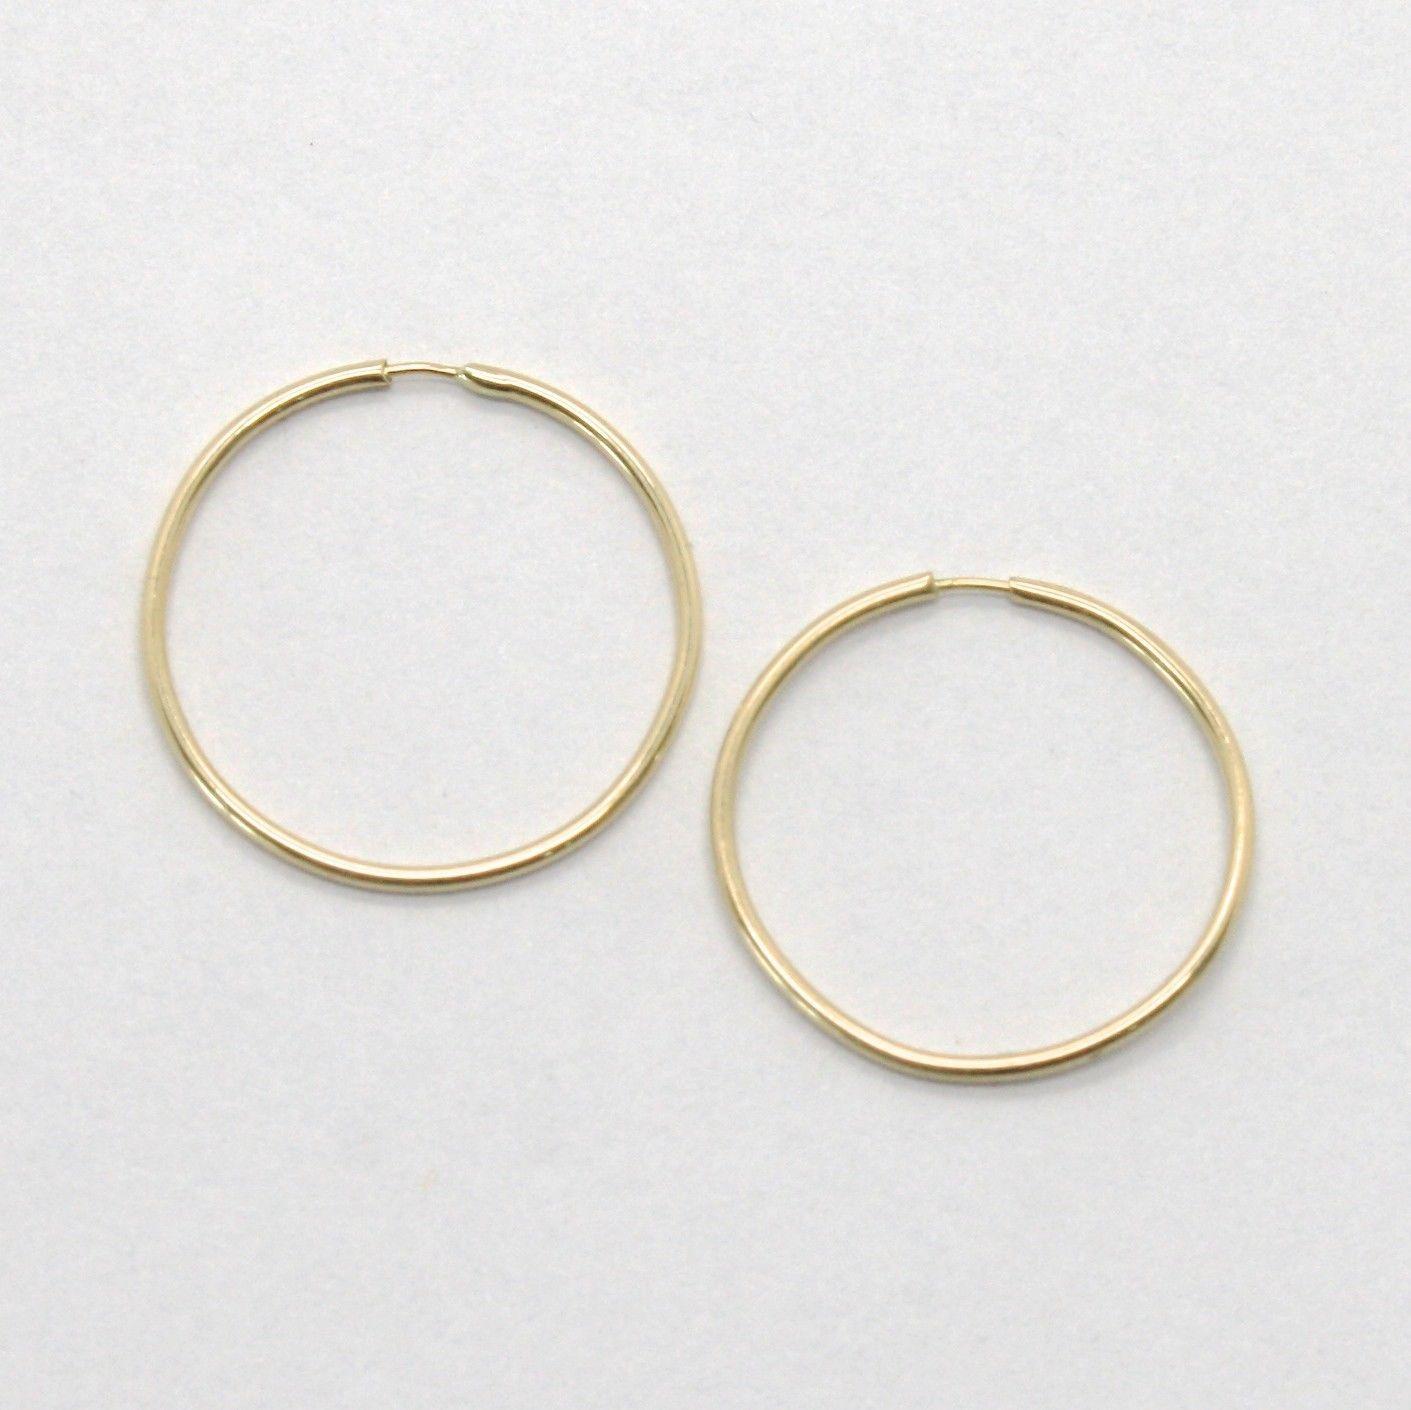 18K YELLOW GOLD CIRCLE HOOPS MINI TUBE 1 MM EARRINGS, DIAMETER 18 MM